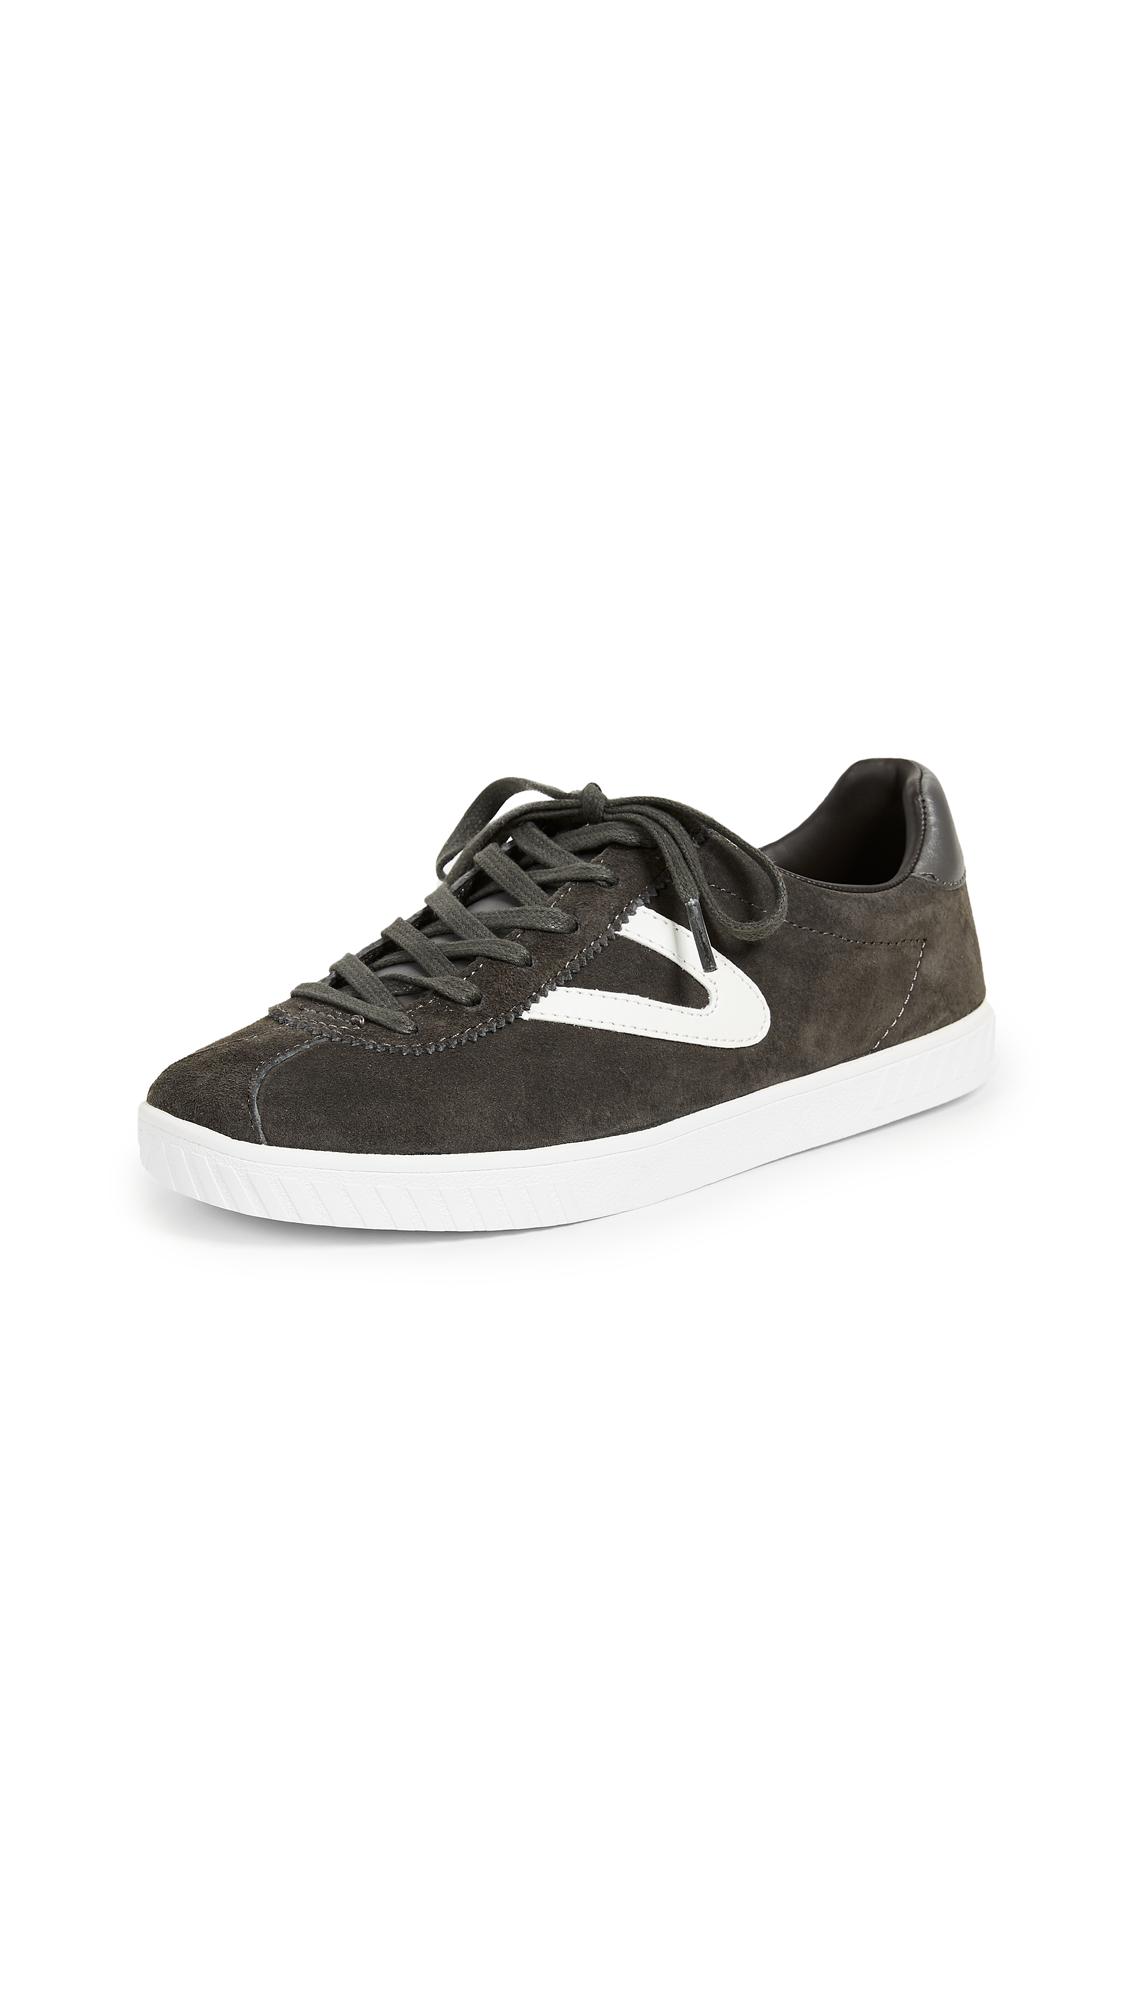 Tretorn Camden Sneakers - Lavagna/White